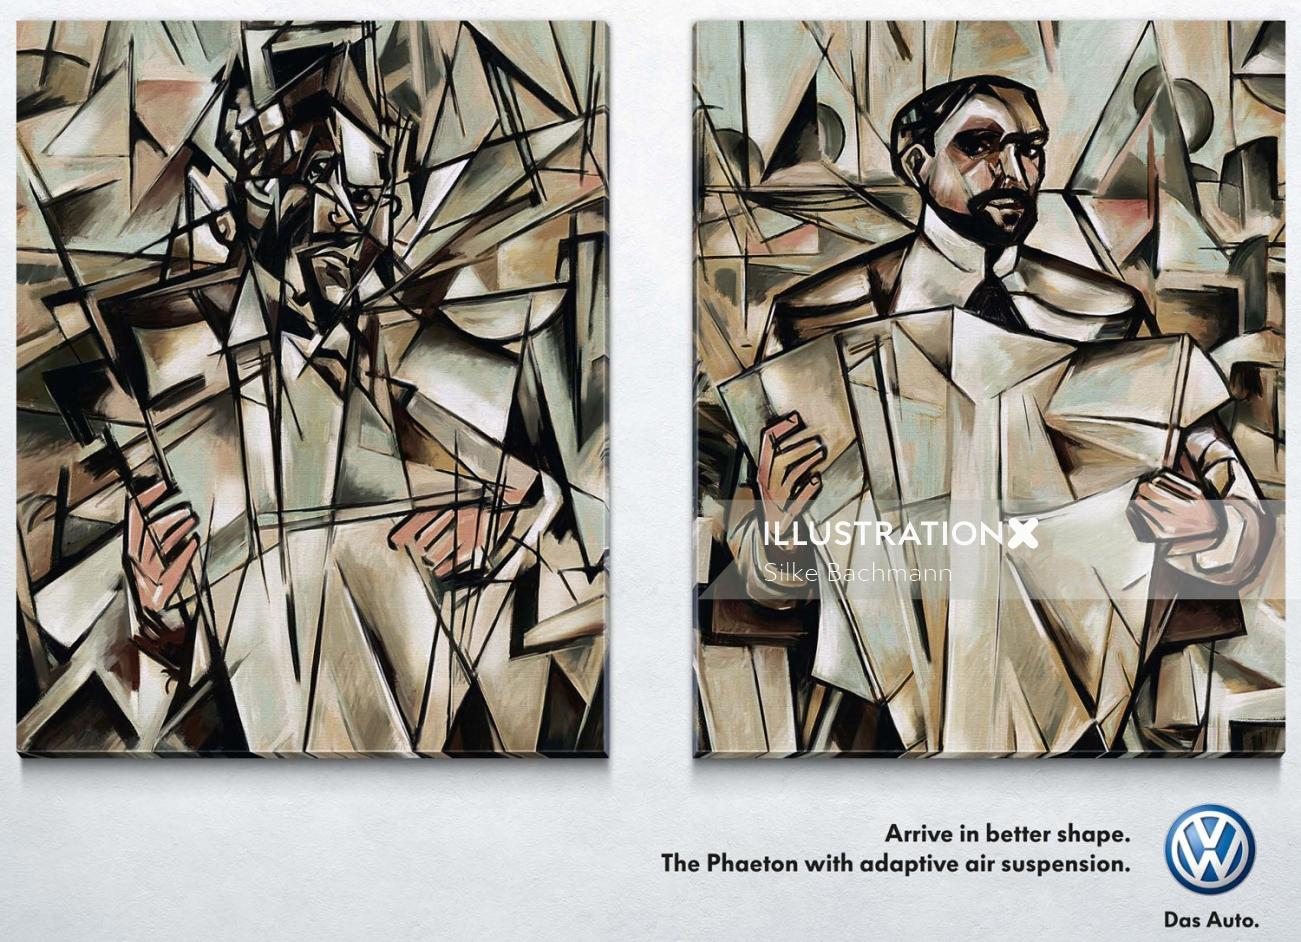 Pastiche art of a man